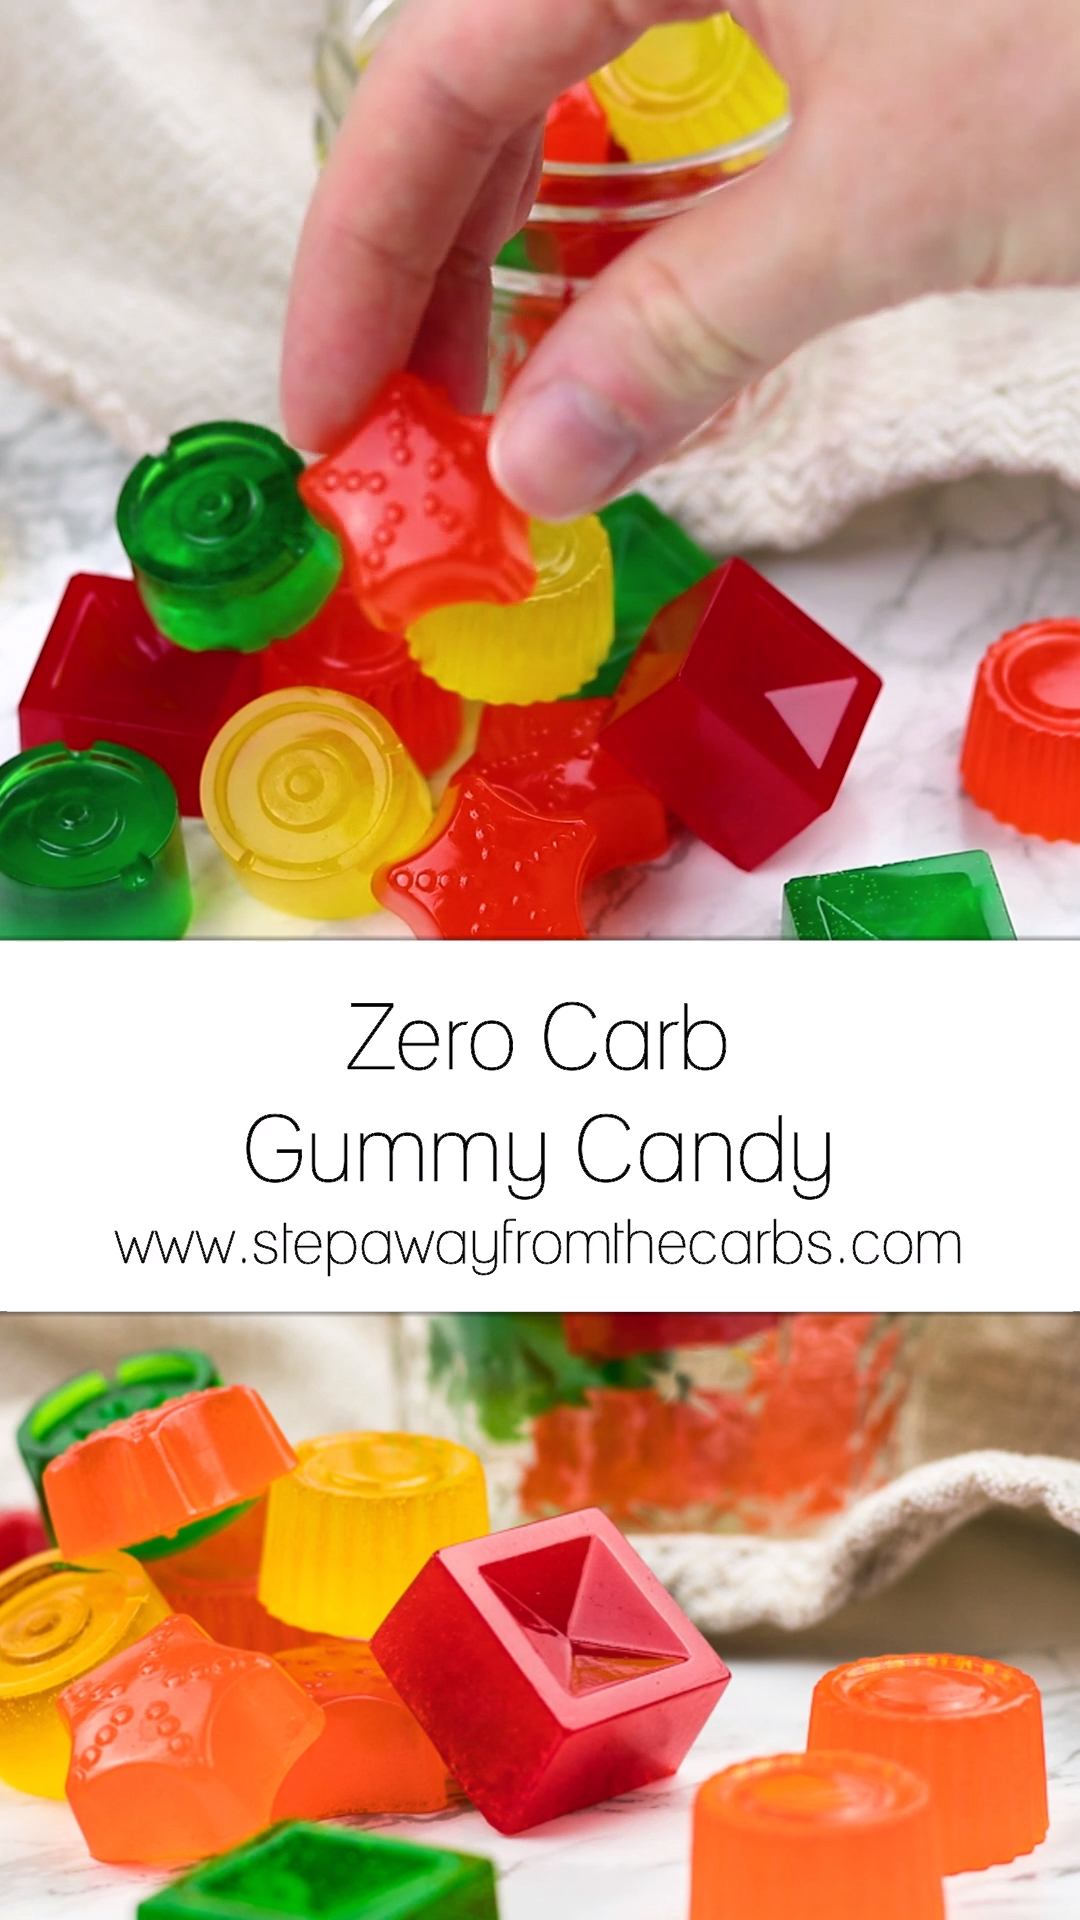 Zero Carb Gummy Candy These zero carb gummy candie